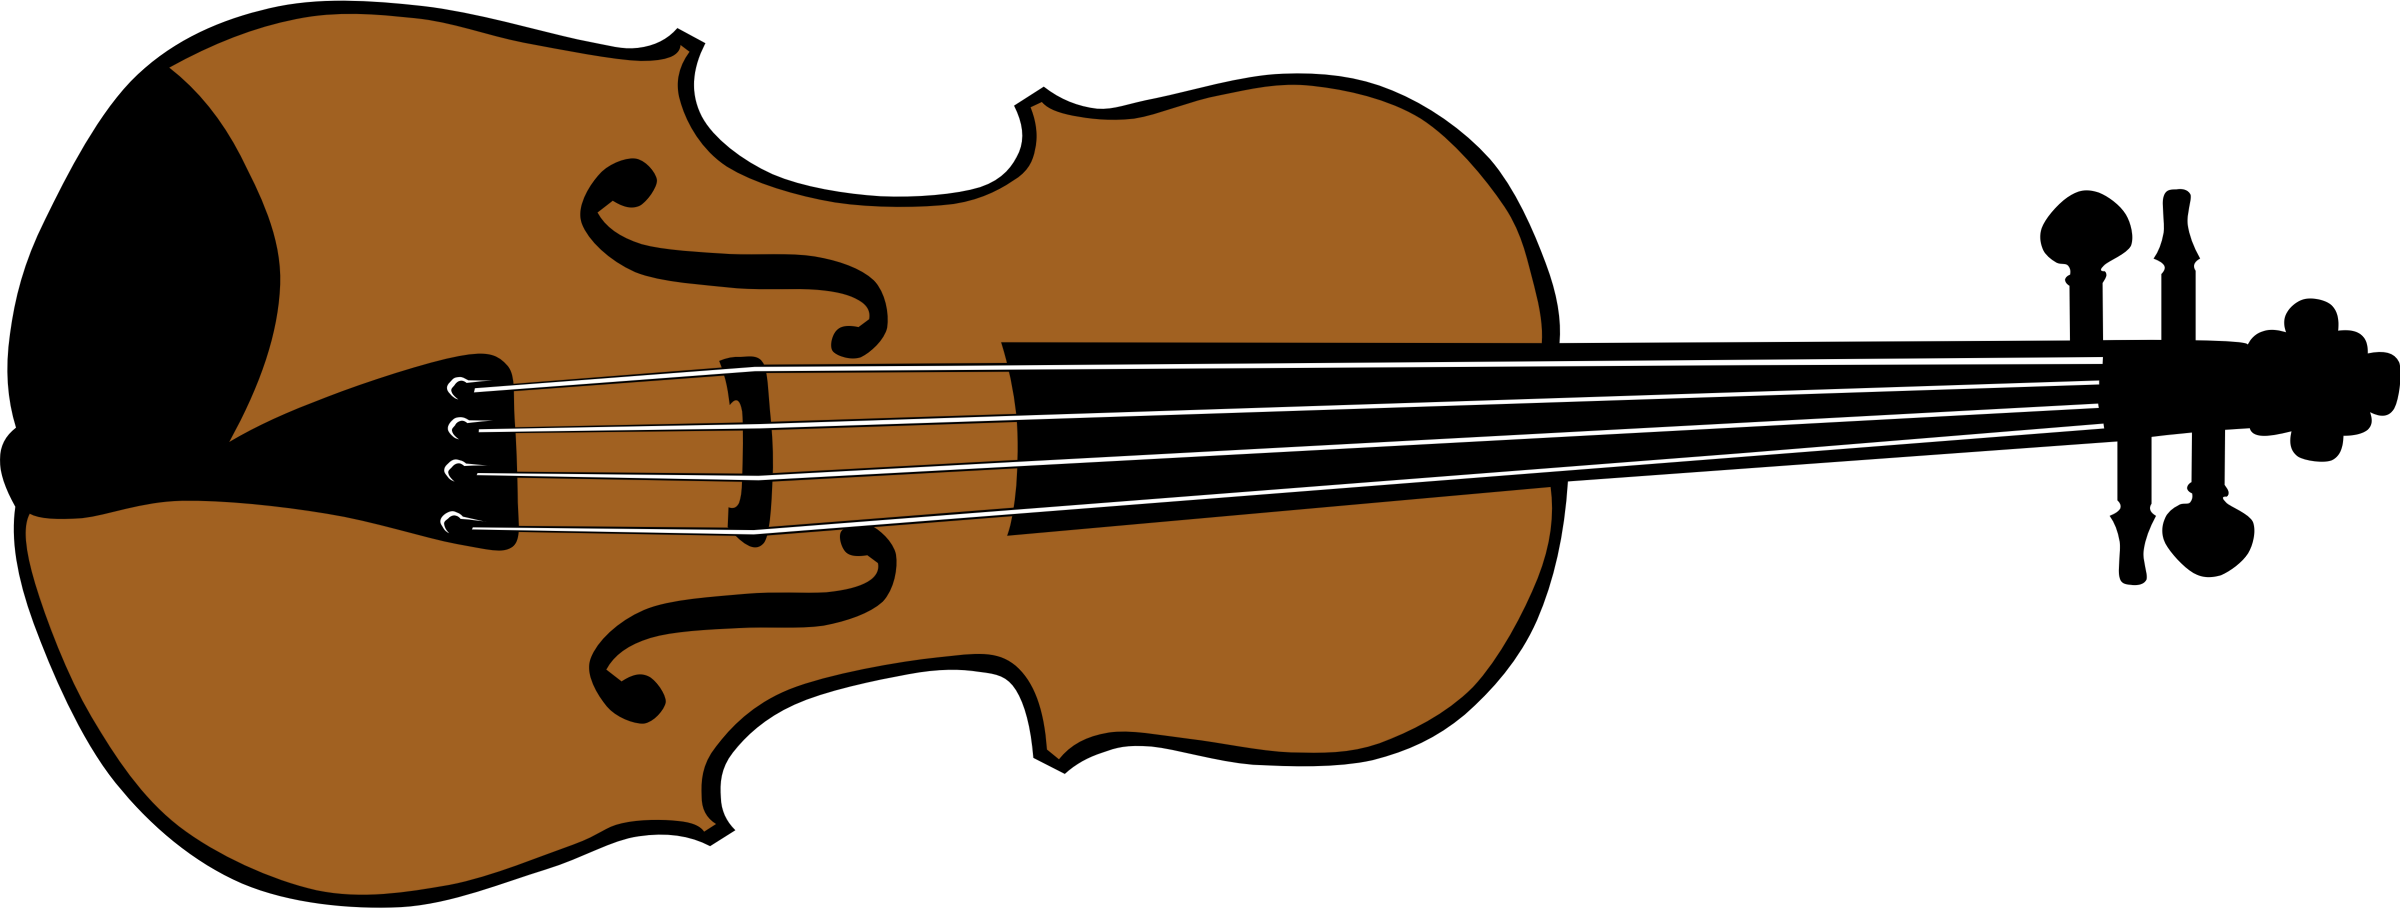 Clipart music violin. Big image png